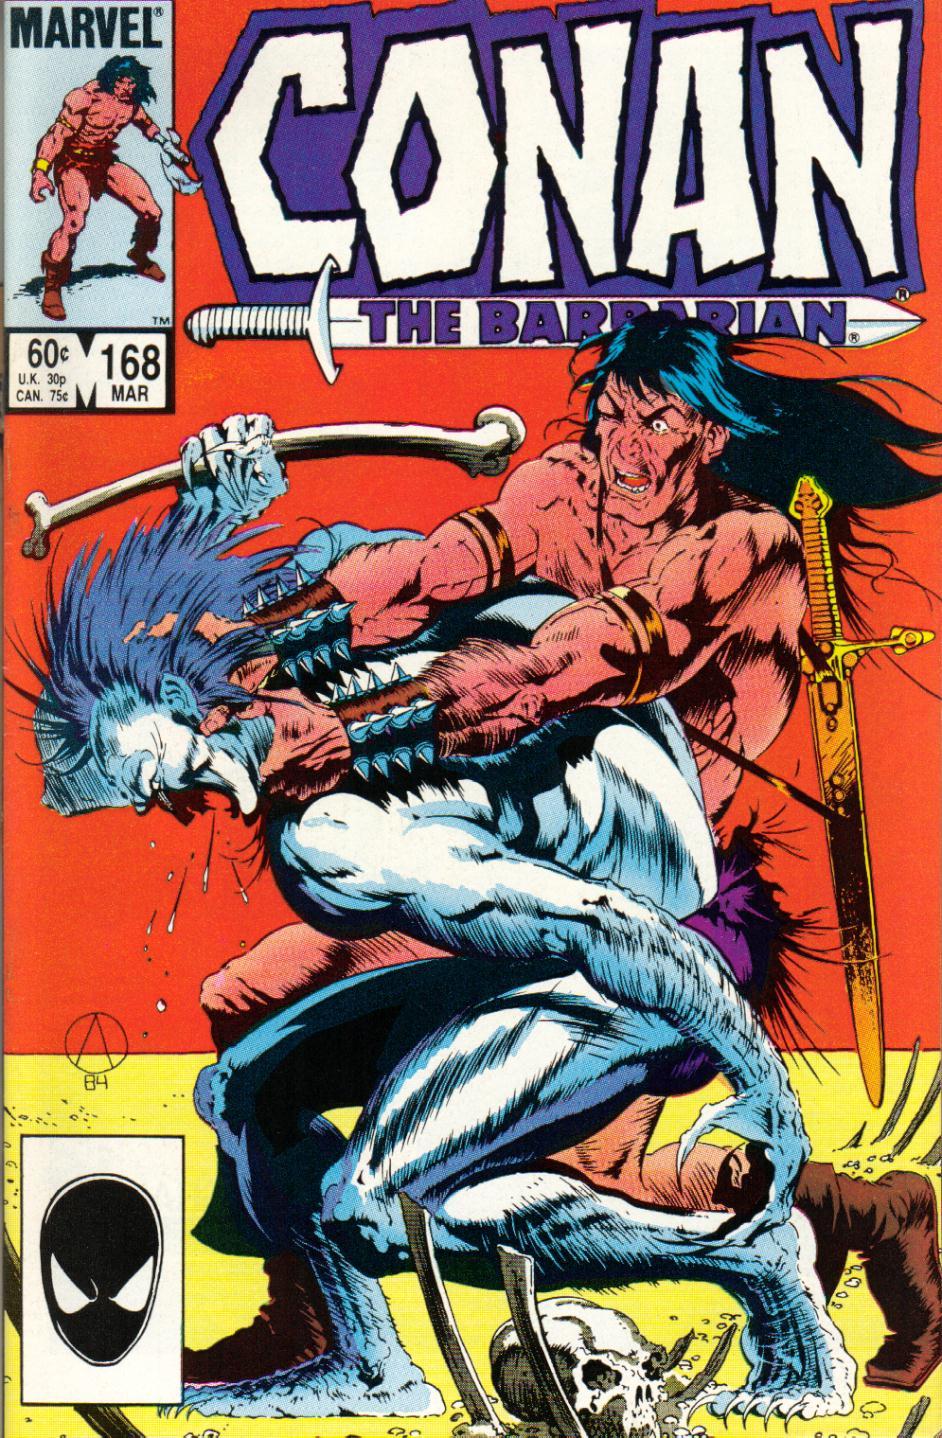 Conan the Barbarian 168